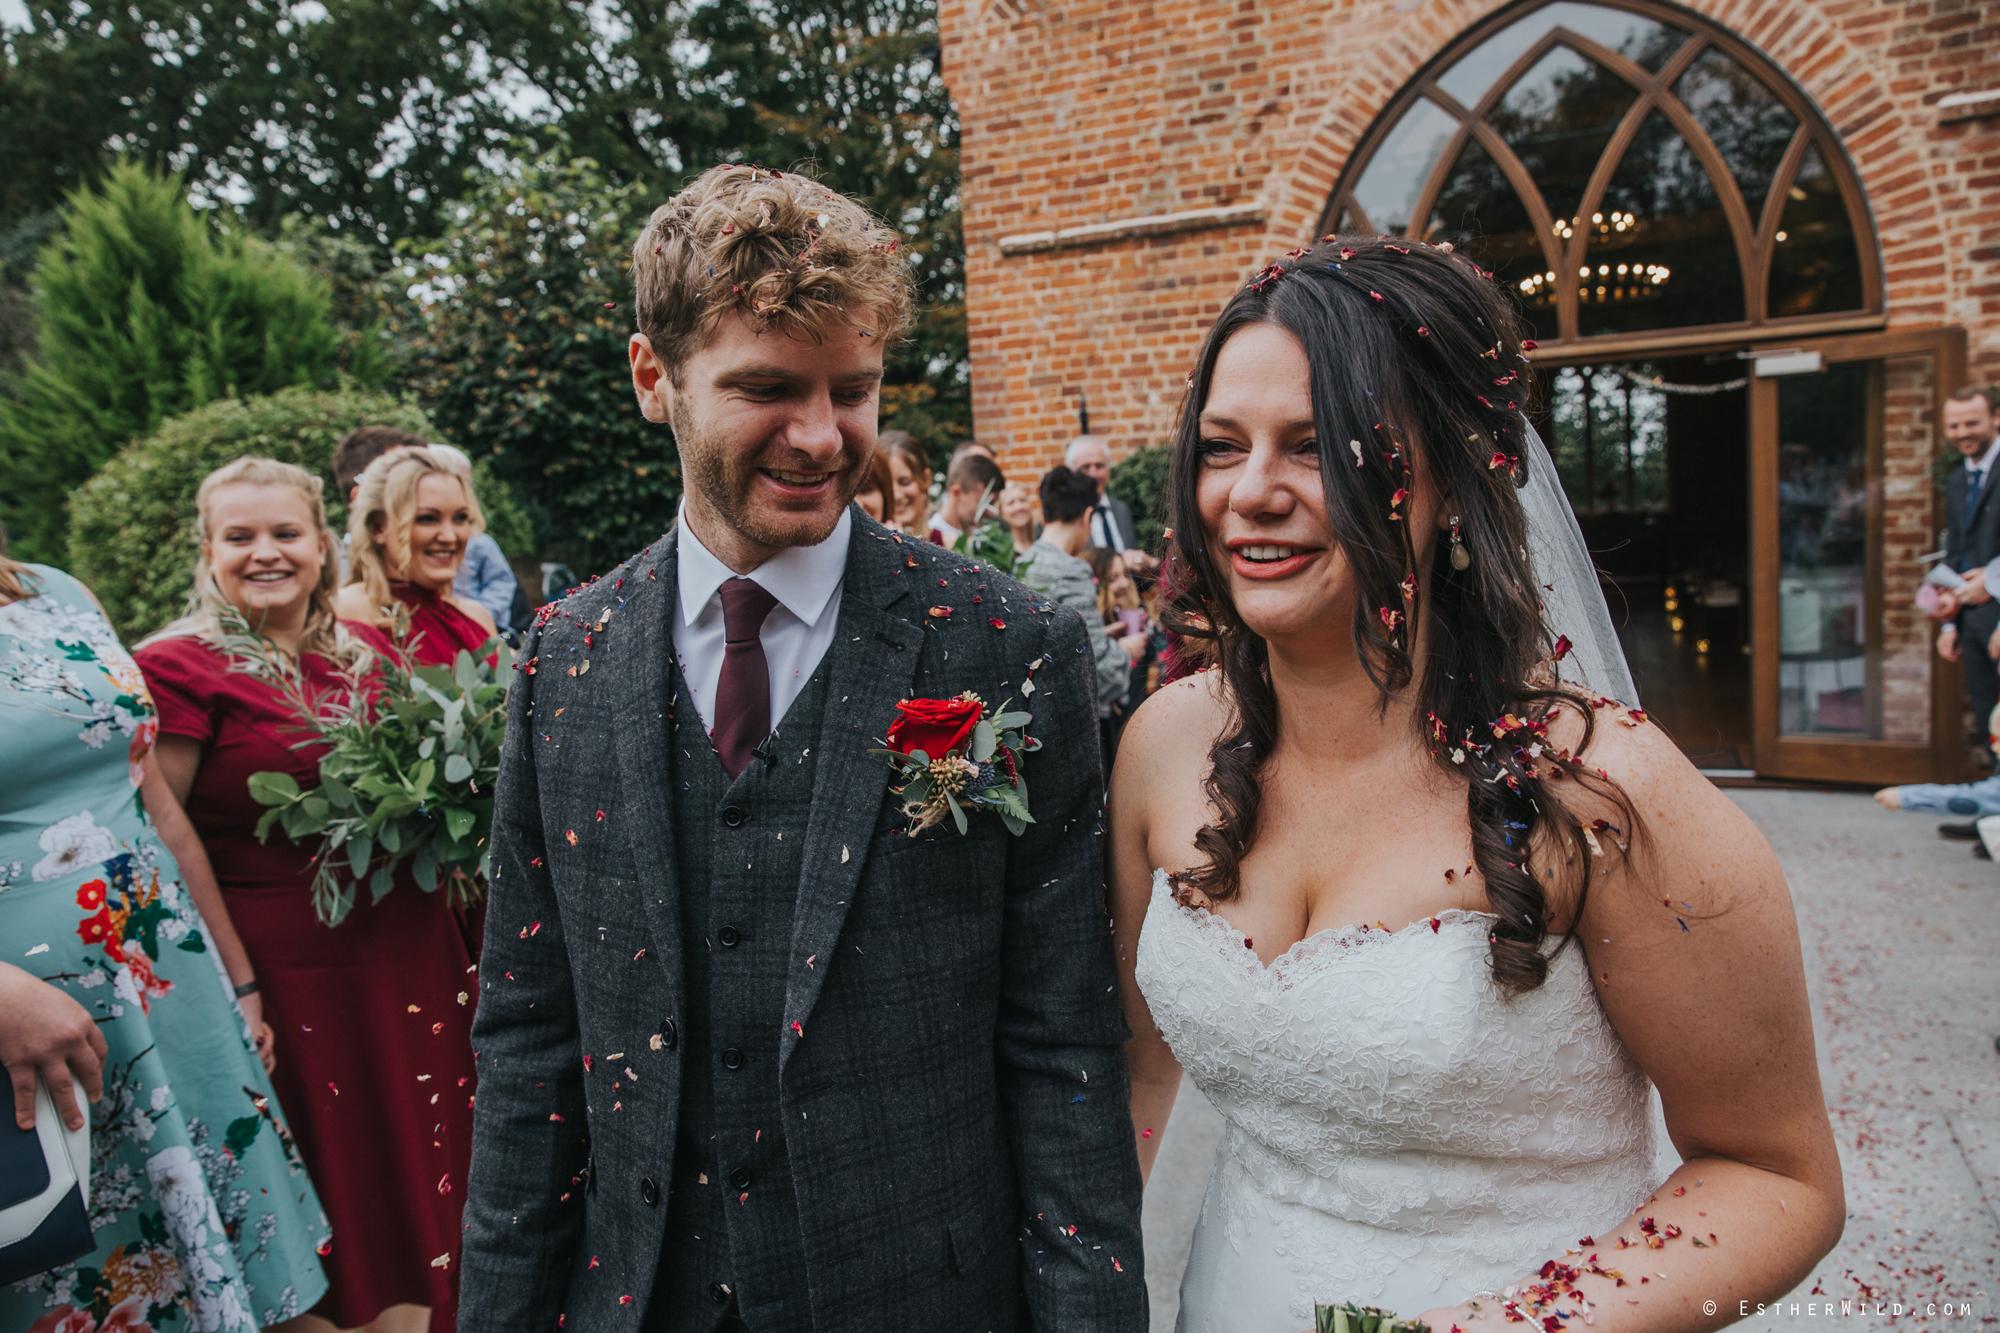 Reading_Room_Weddings_Alby_Norwich_Photographer_Esther_Wild_IMG_1159.jpg